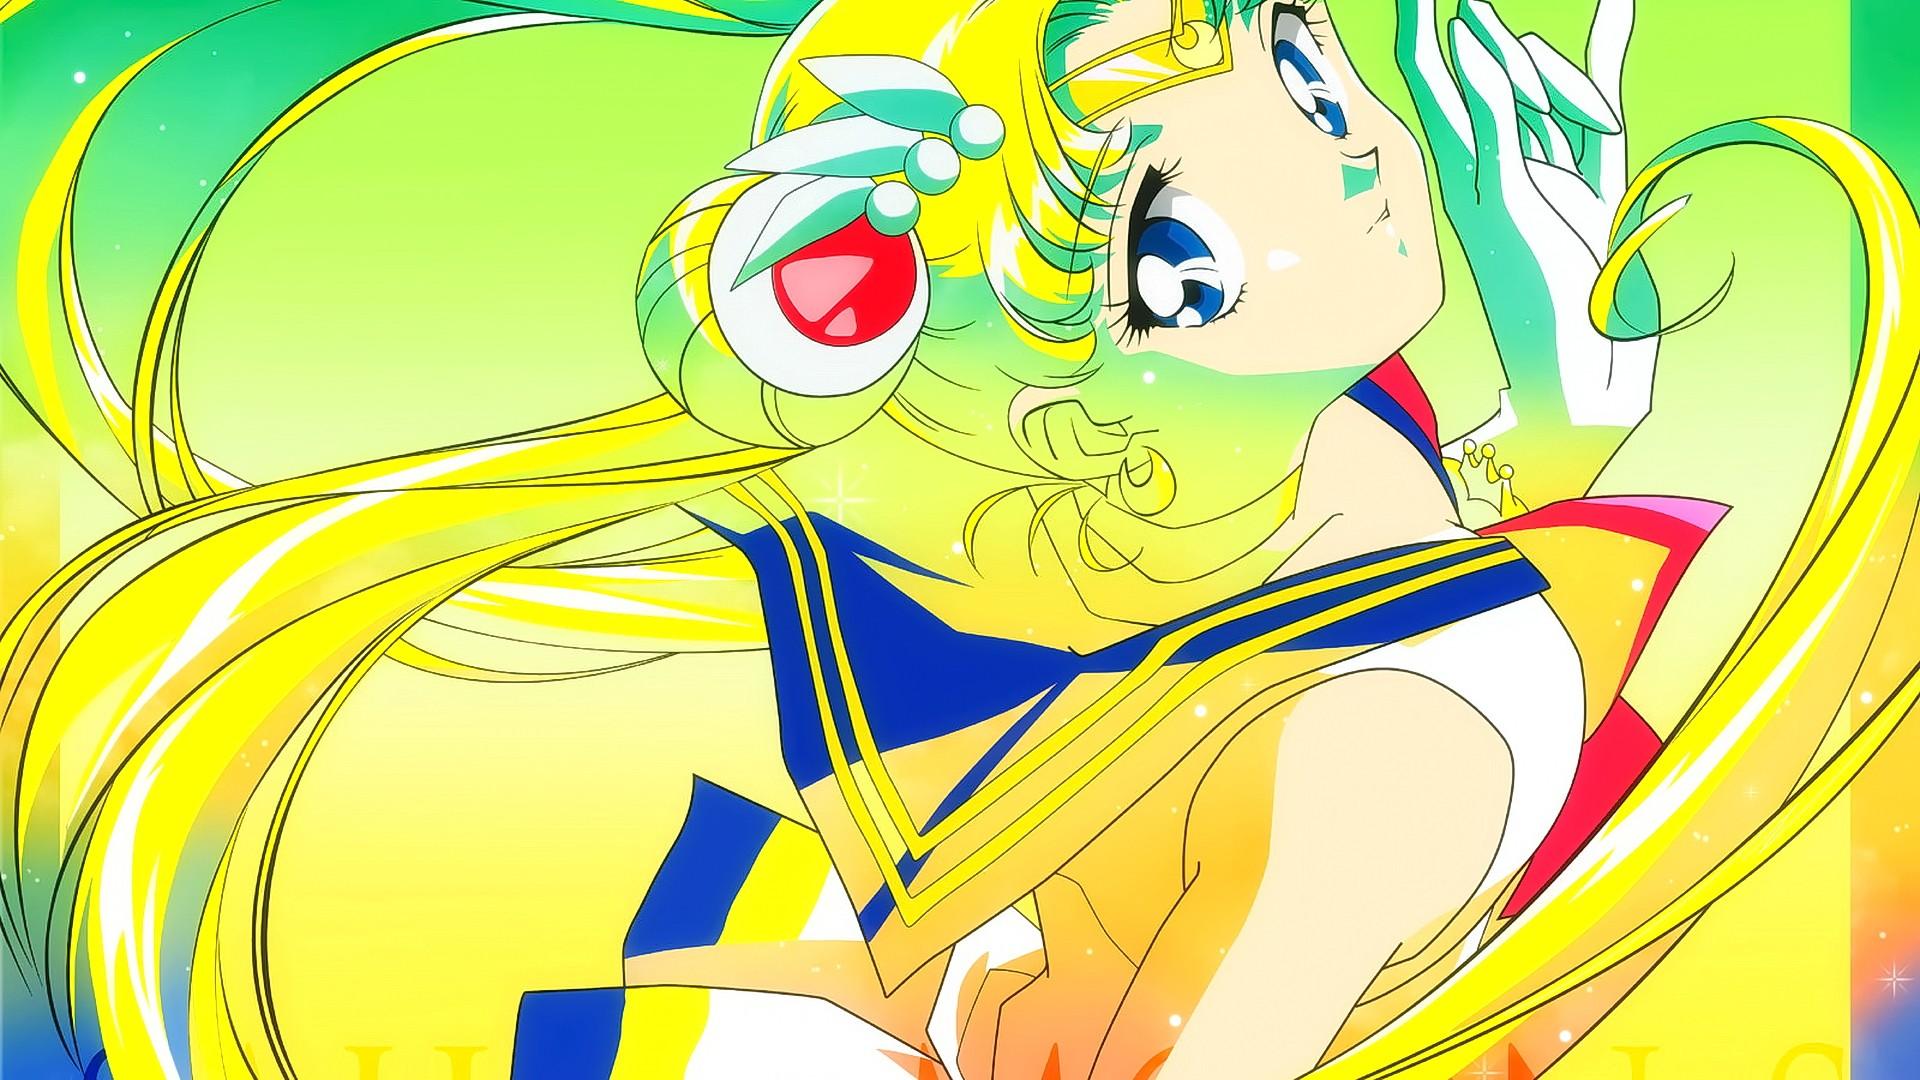 Wallpaper Ilustrasi Rambut Panjang Gadis Anime Mata